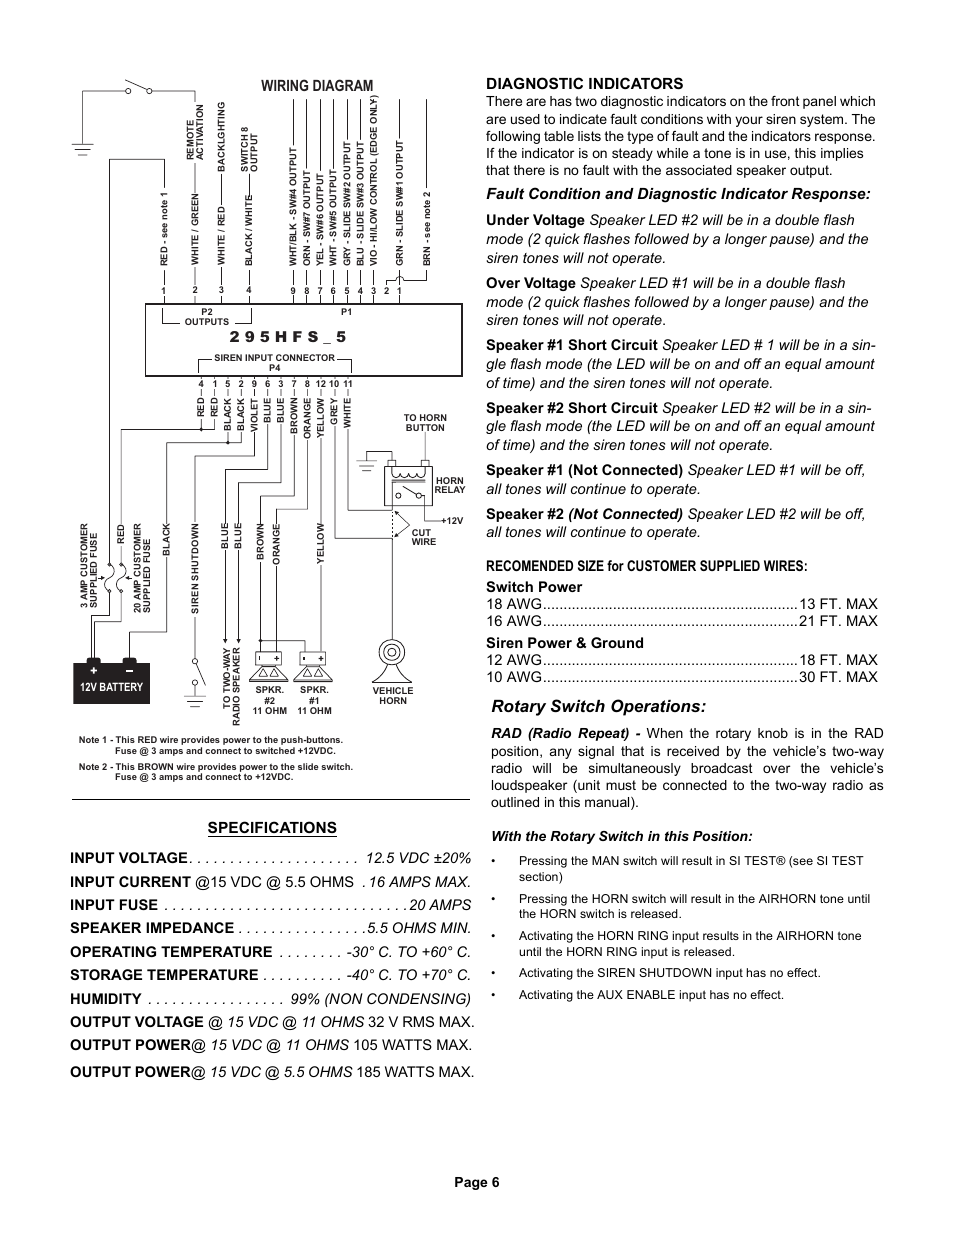 Whelen 295hfsa5 Installation Manual Data Wiring Diagrams How To Install Siren Rotary Switch Operations Diagram 2 9 5 H F S Rh Manualsdir Com 295hfsa6 295hfsa1